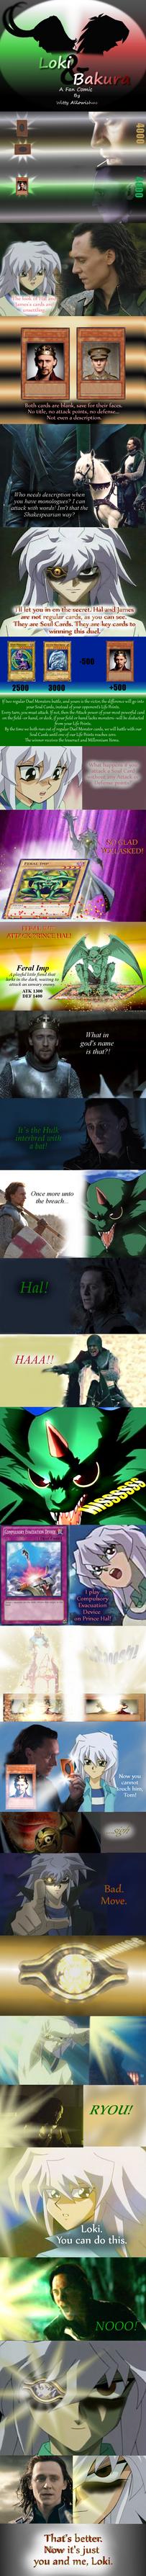 Loki and Bakura XXXVIII - Ryou by Loki-Bakura